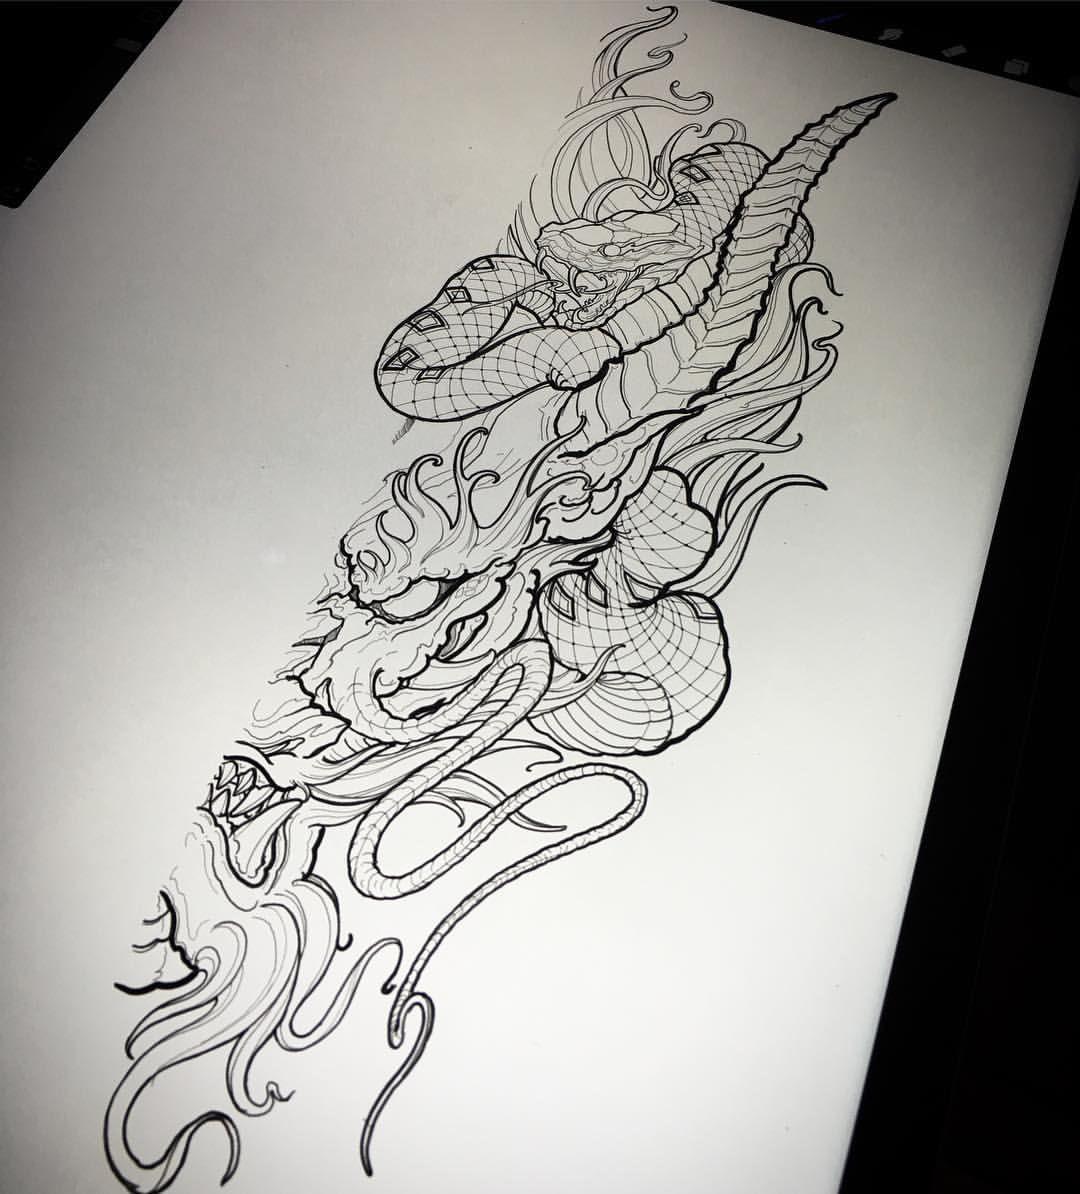 Chronic Ink Tattoo Kitsilano Vancouver Asian Tattoos Ed Truong Dragon Japanese Tattoo Designs Tattoos Japanese Tattoo Art